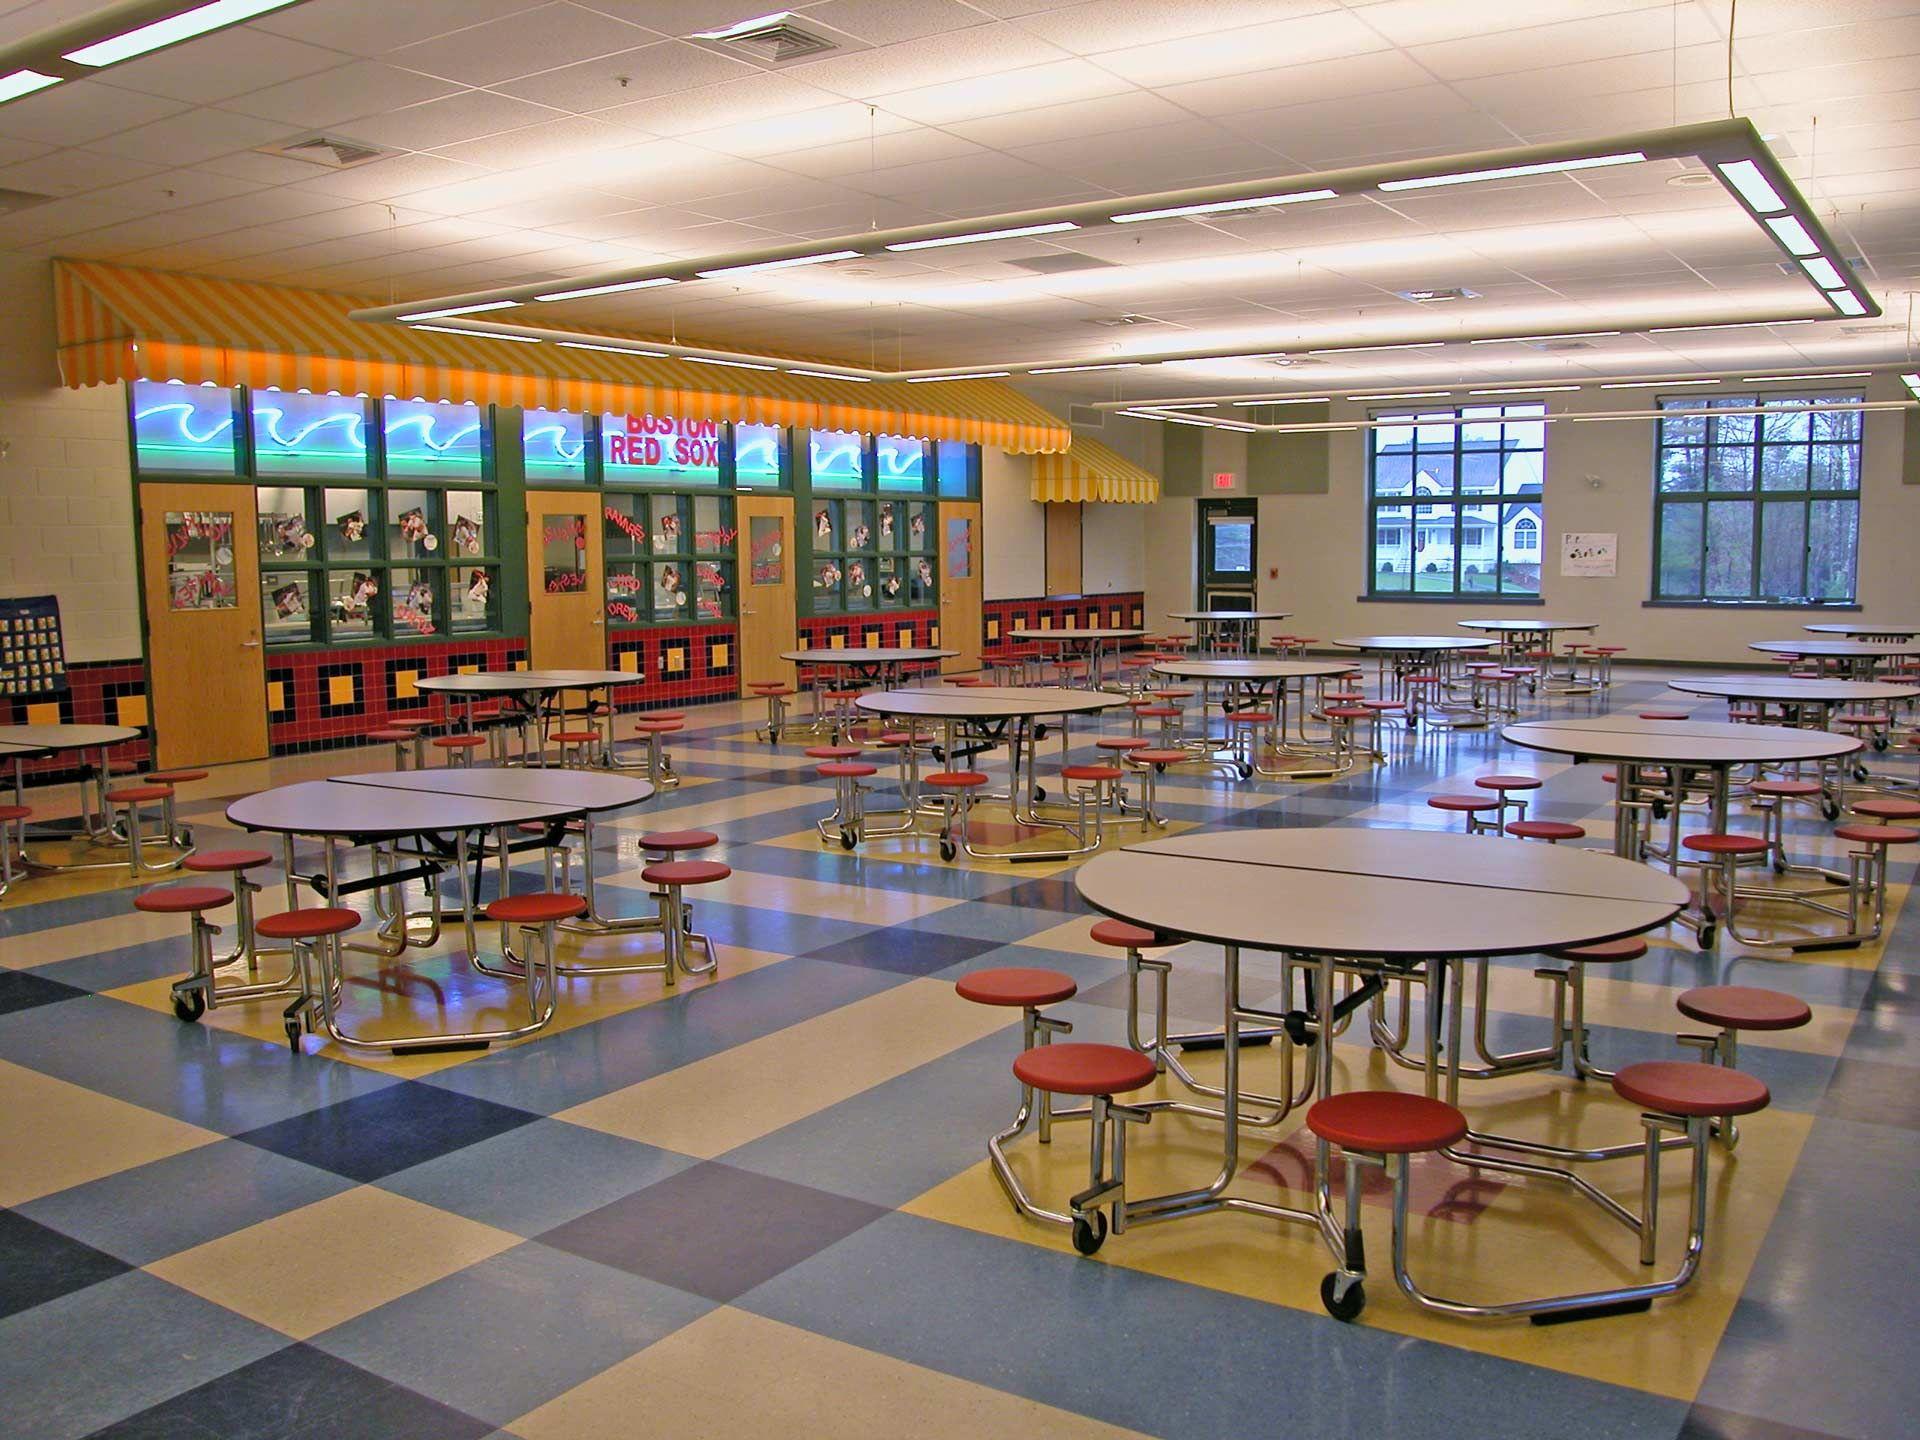 School Cafeteria Decorations Ideas Just BCAUSE